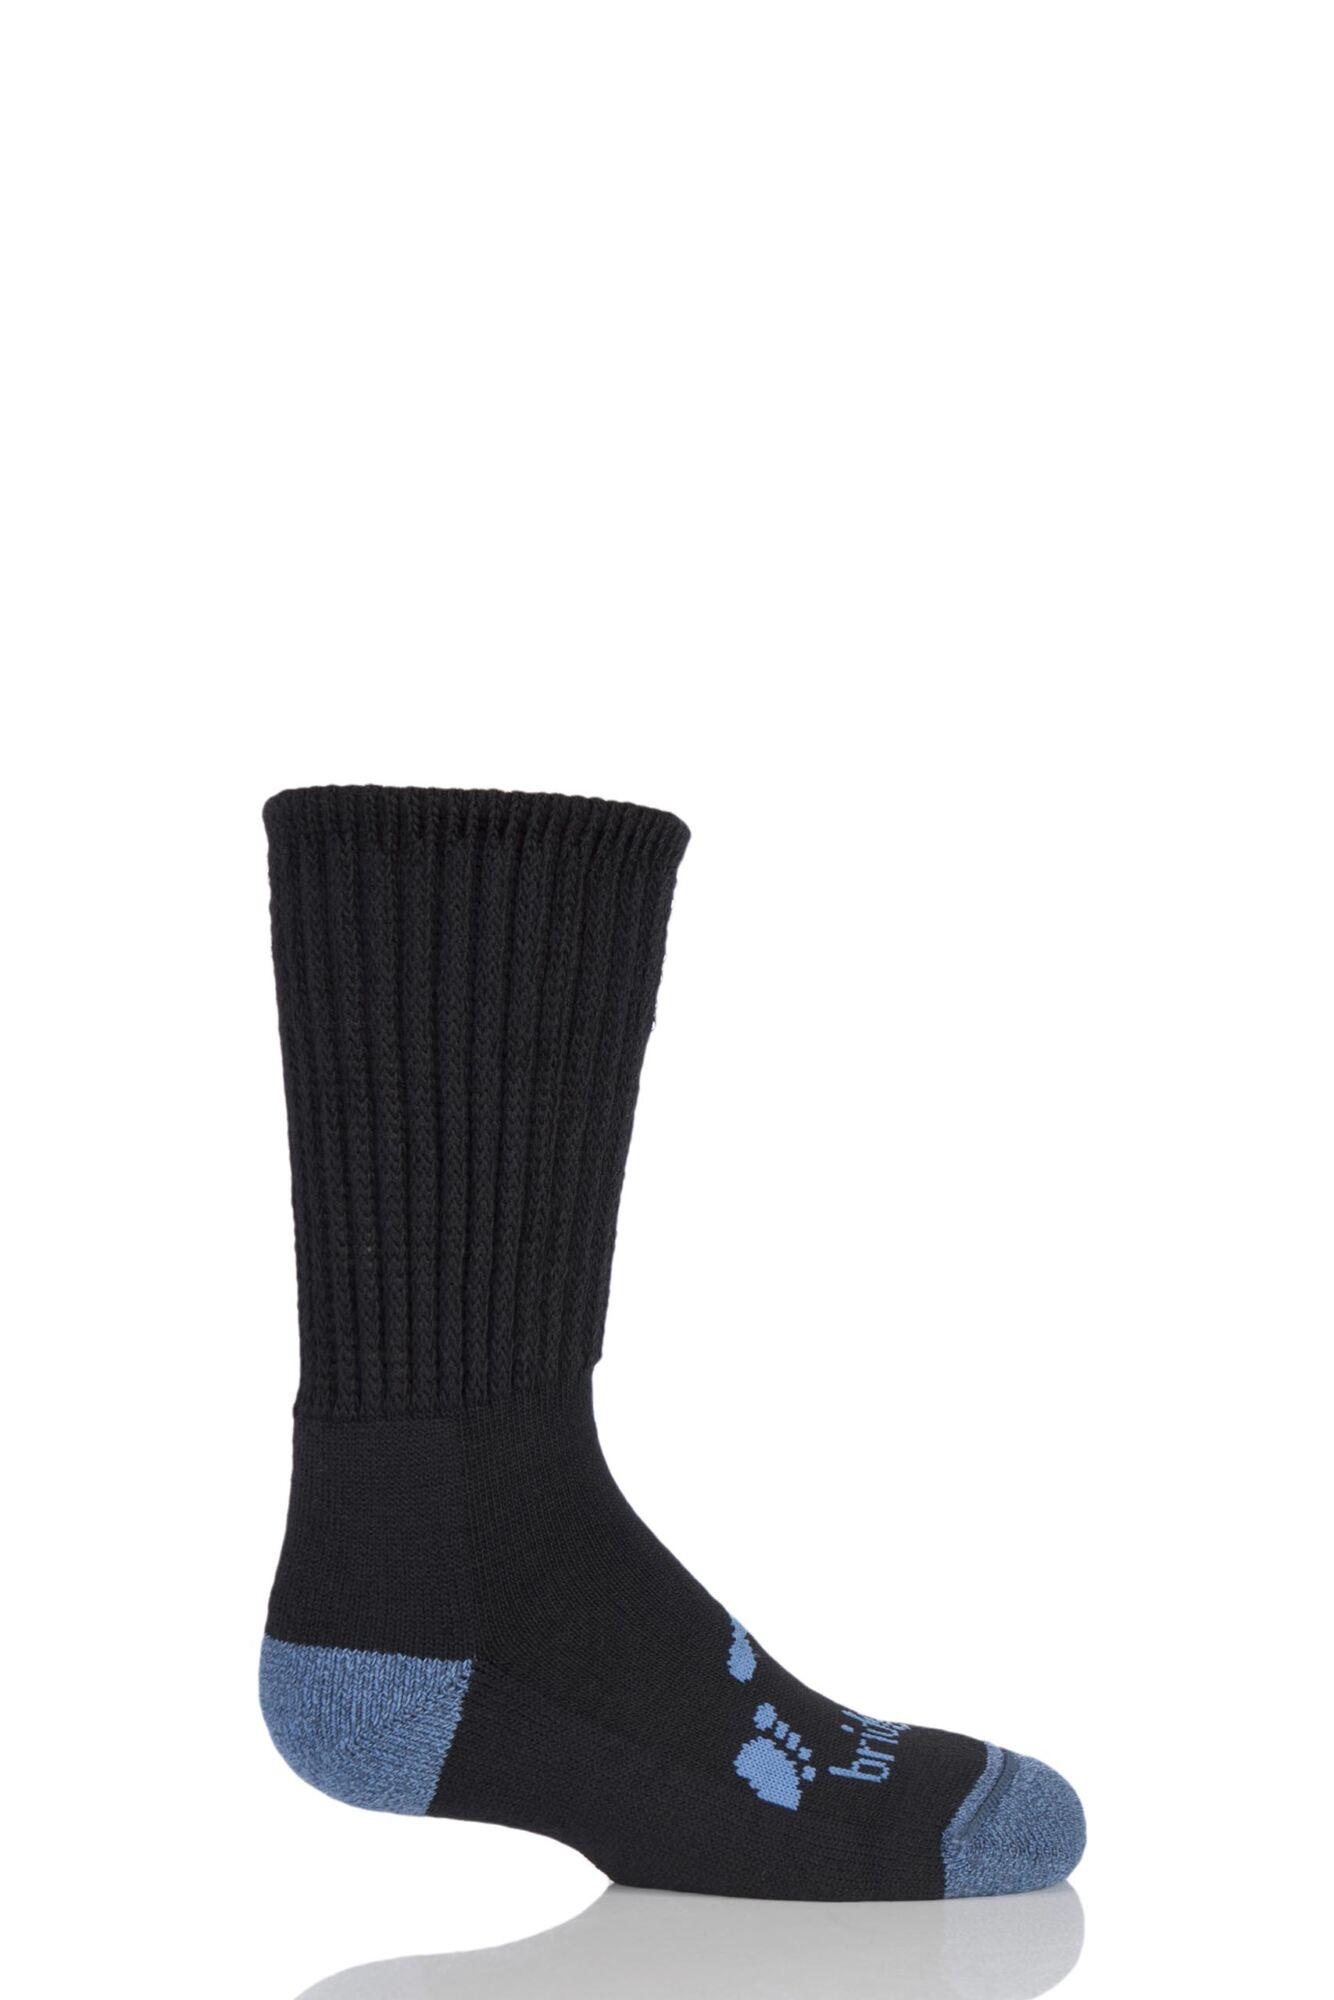 1 Pair Junior Trekker Socks All Day Comfort Kids Unisex - Bridgedale